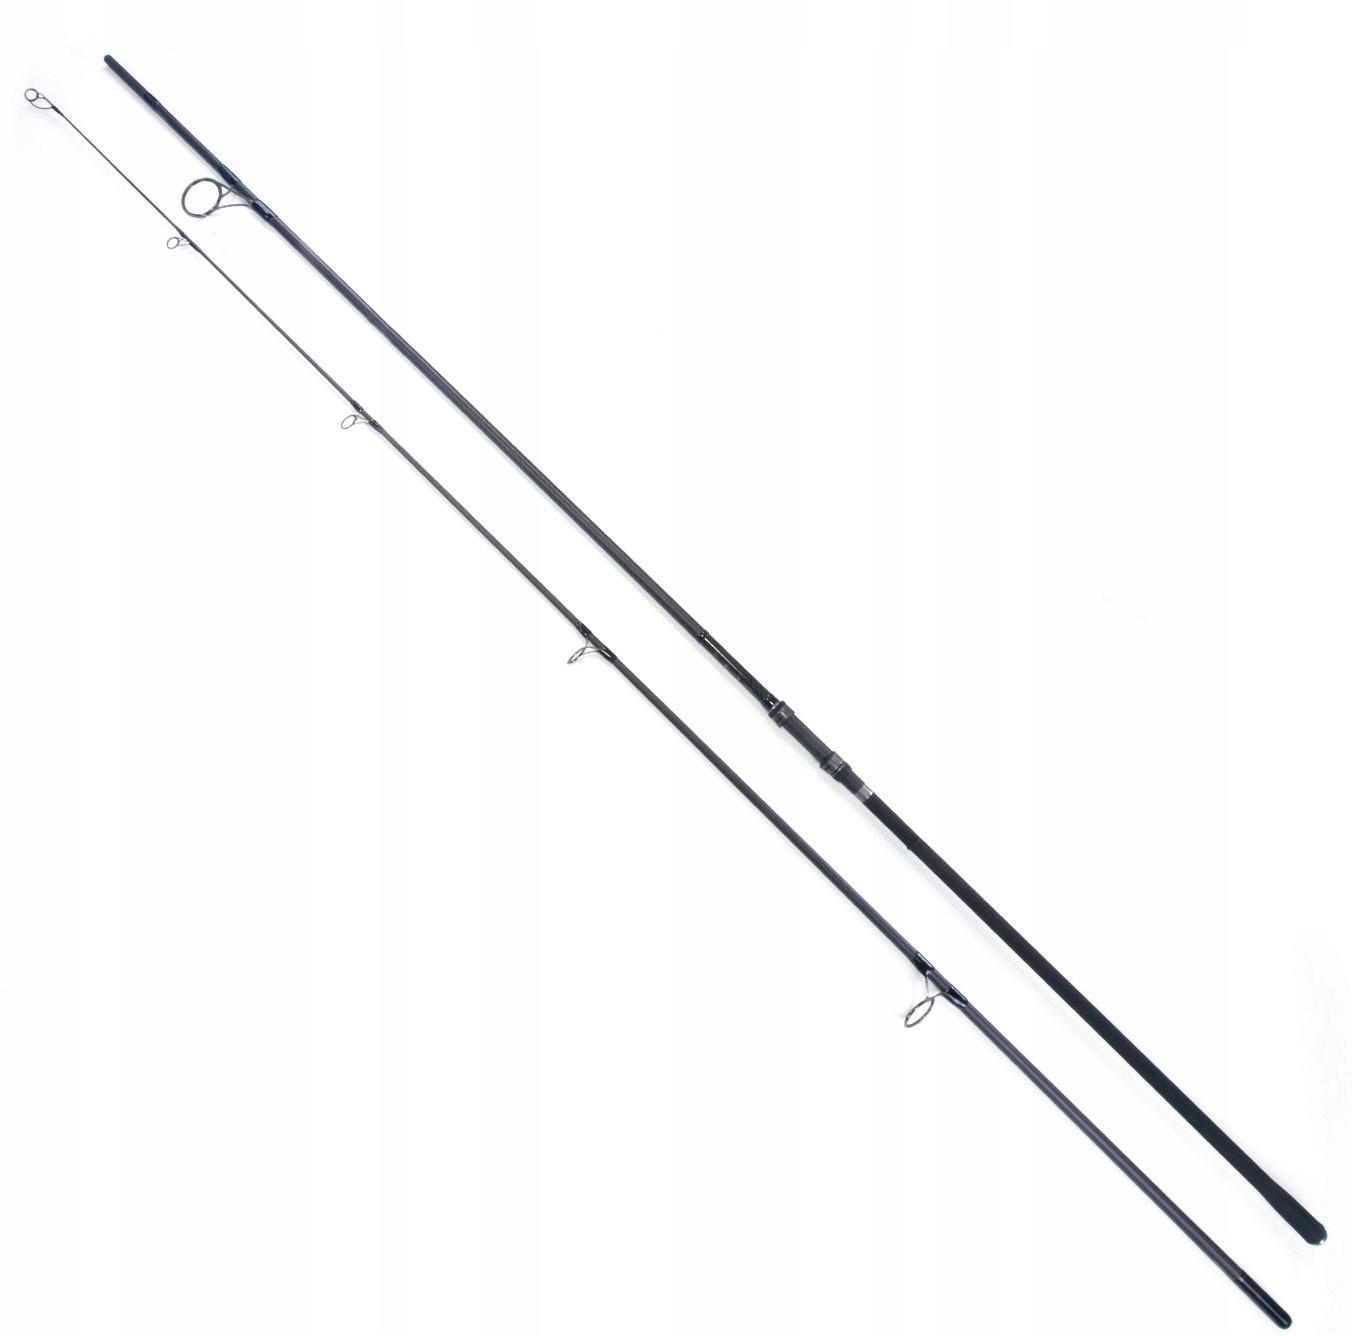 Rybolov-prút Shimano TX-4 10-275 - 3,04 m 2,75 lb